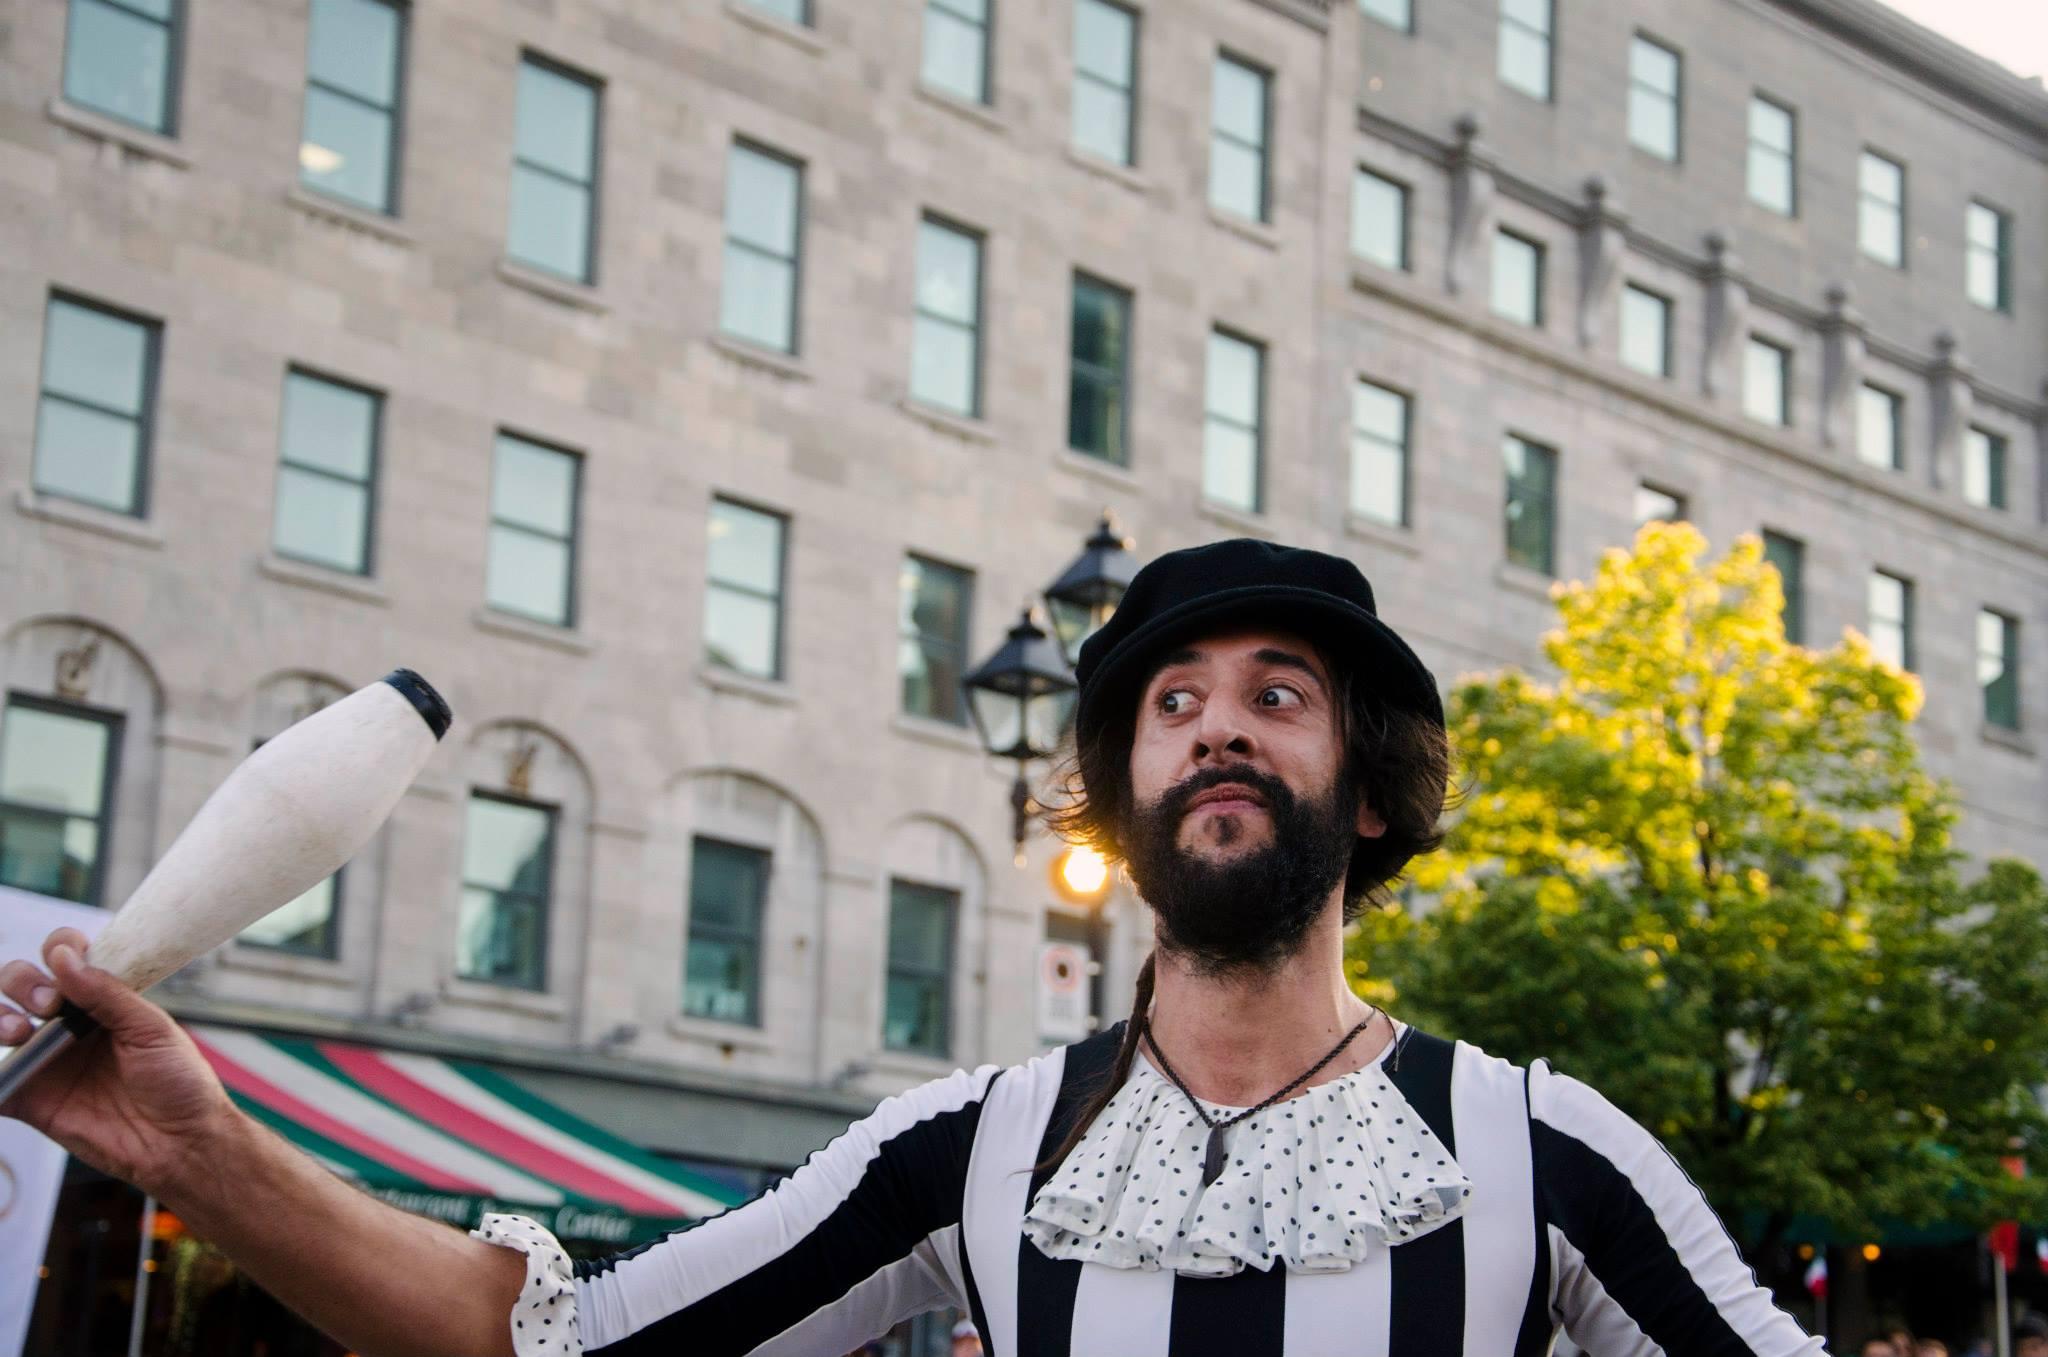 Jenkins, Cheyenne. Street Performers . 2015. Digital Photography. Montreal, Quebec.